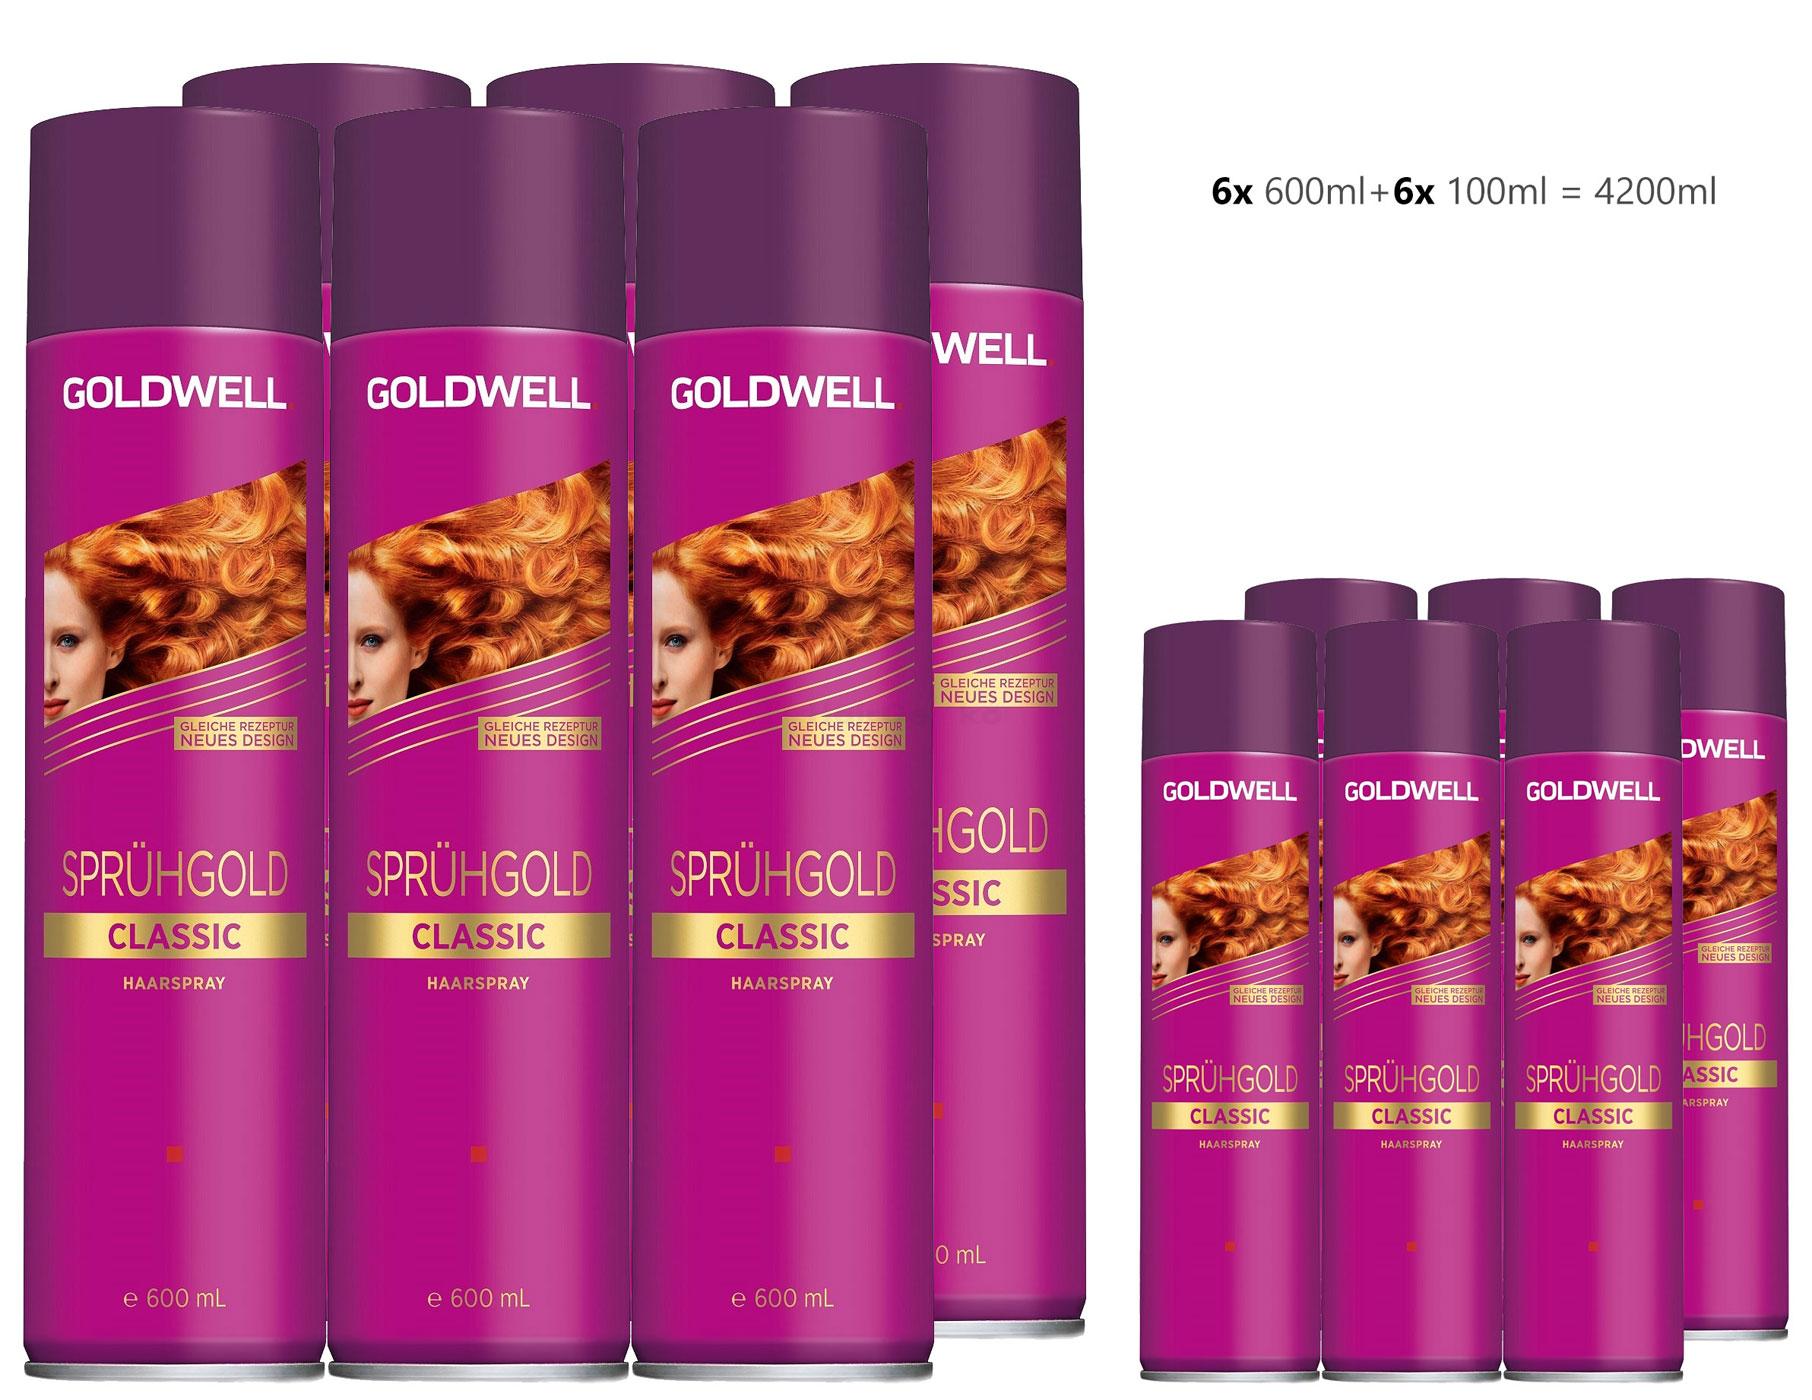 Goldwell Sprühgold Classic unisex, Haarspray Aktion 6x 600ml + 6x 100ml = 4200ml